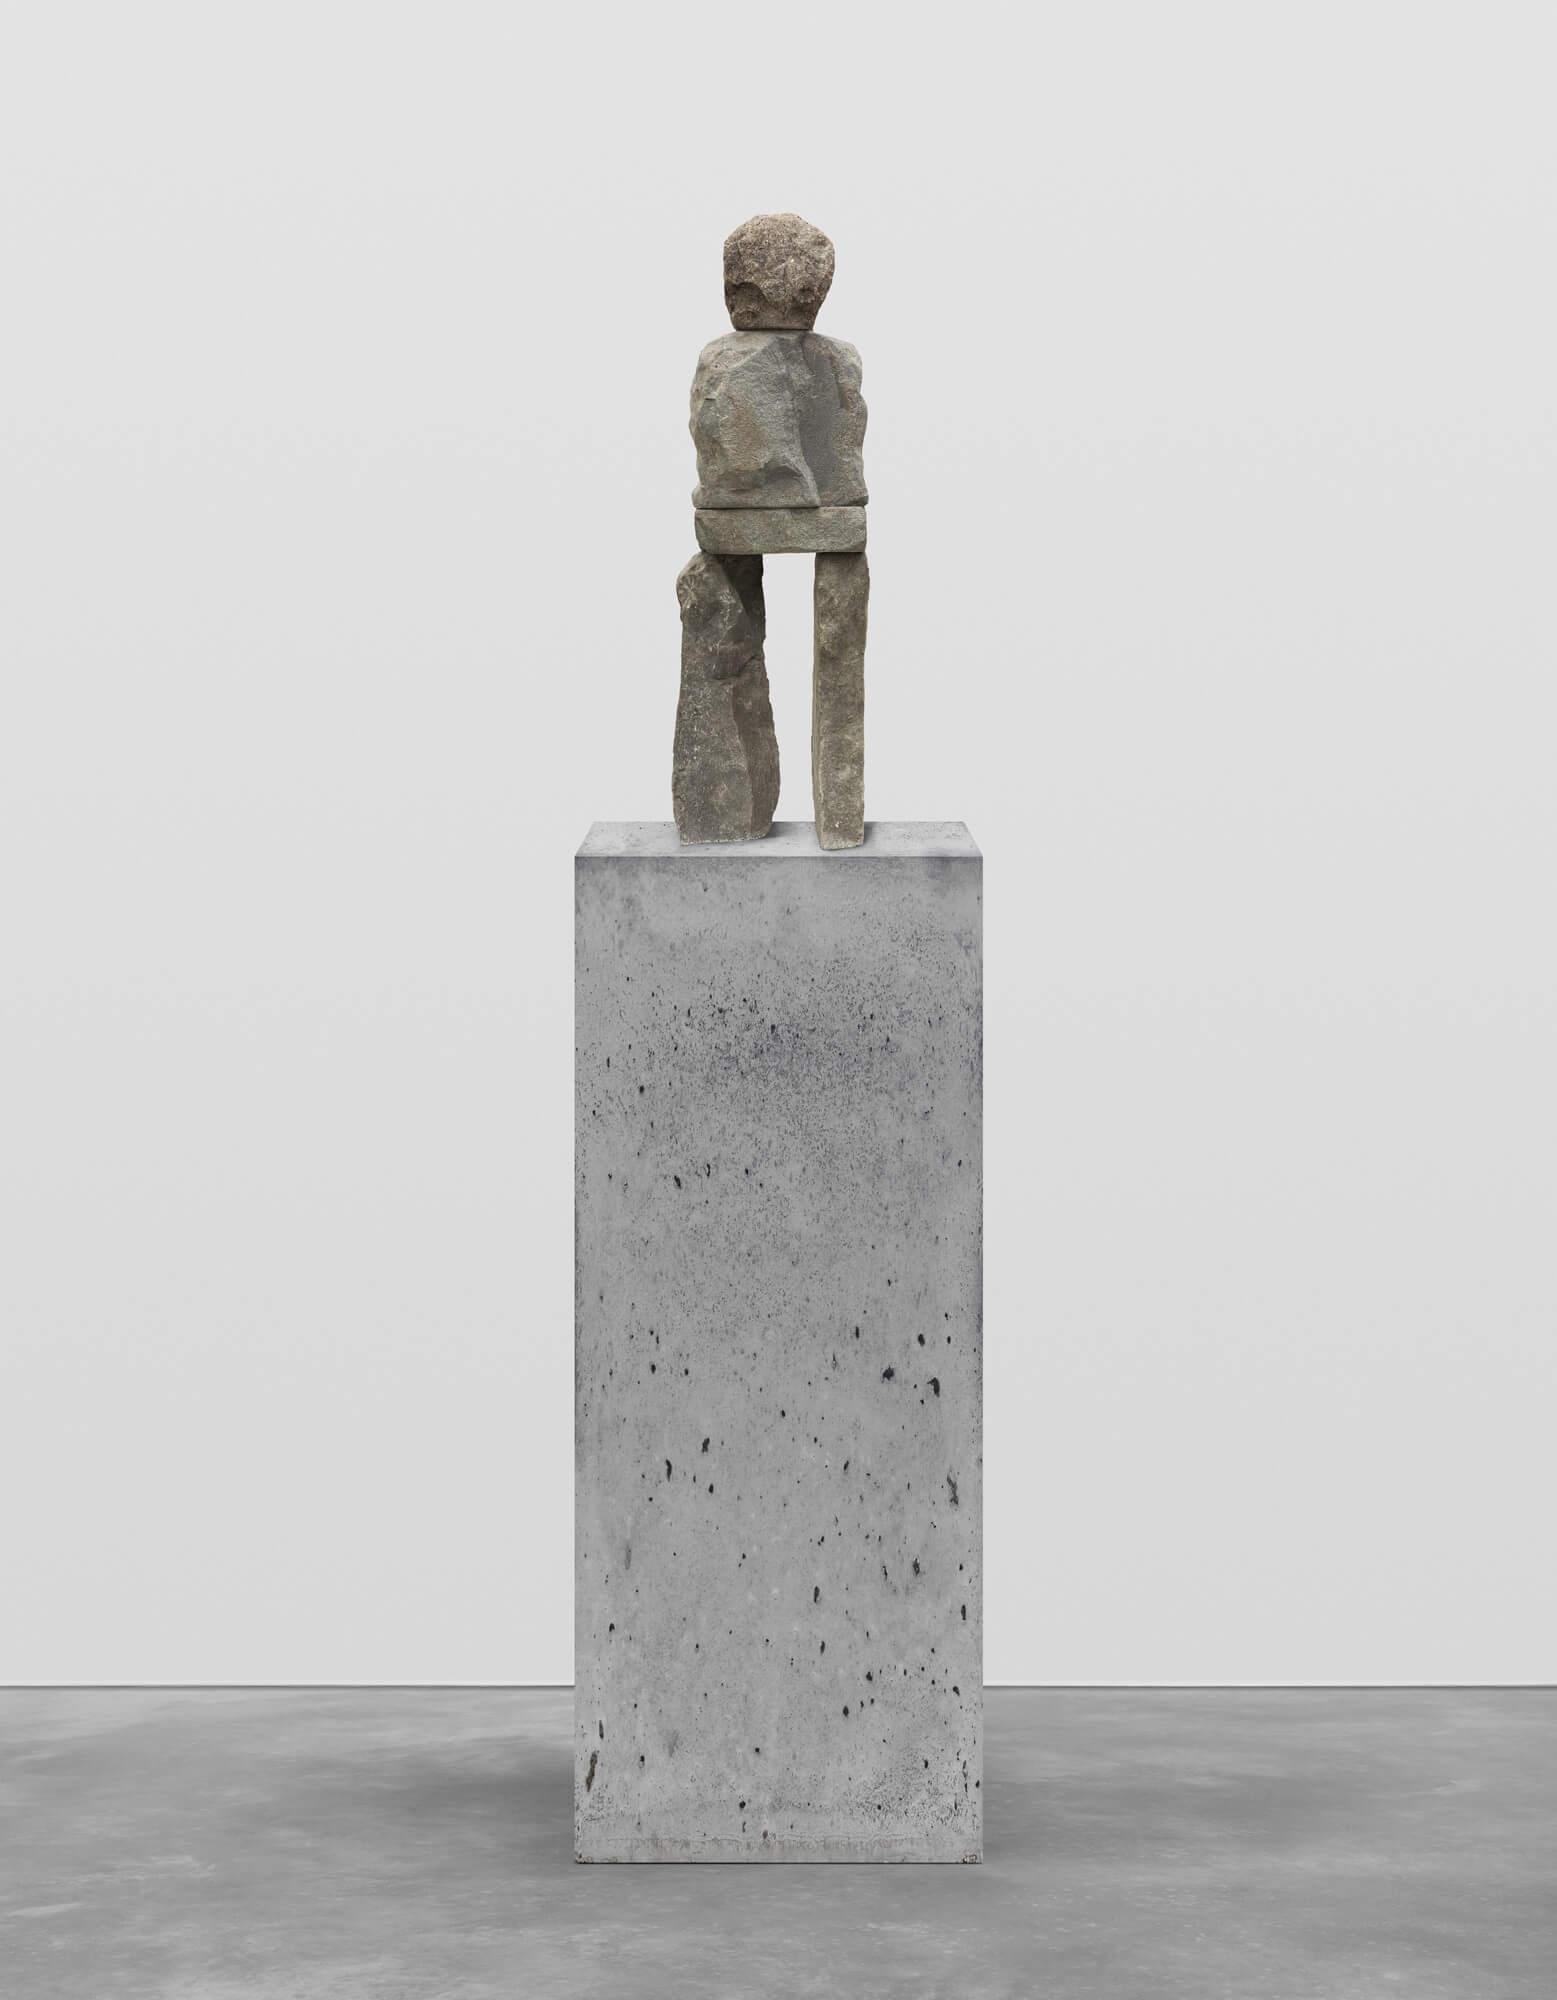 THE JOLLY | UGO RONDINONE